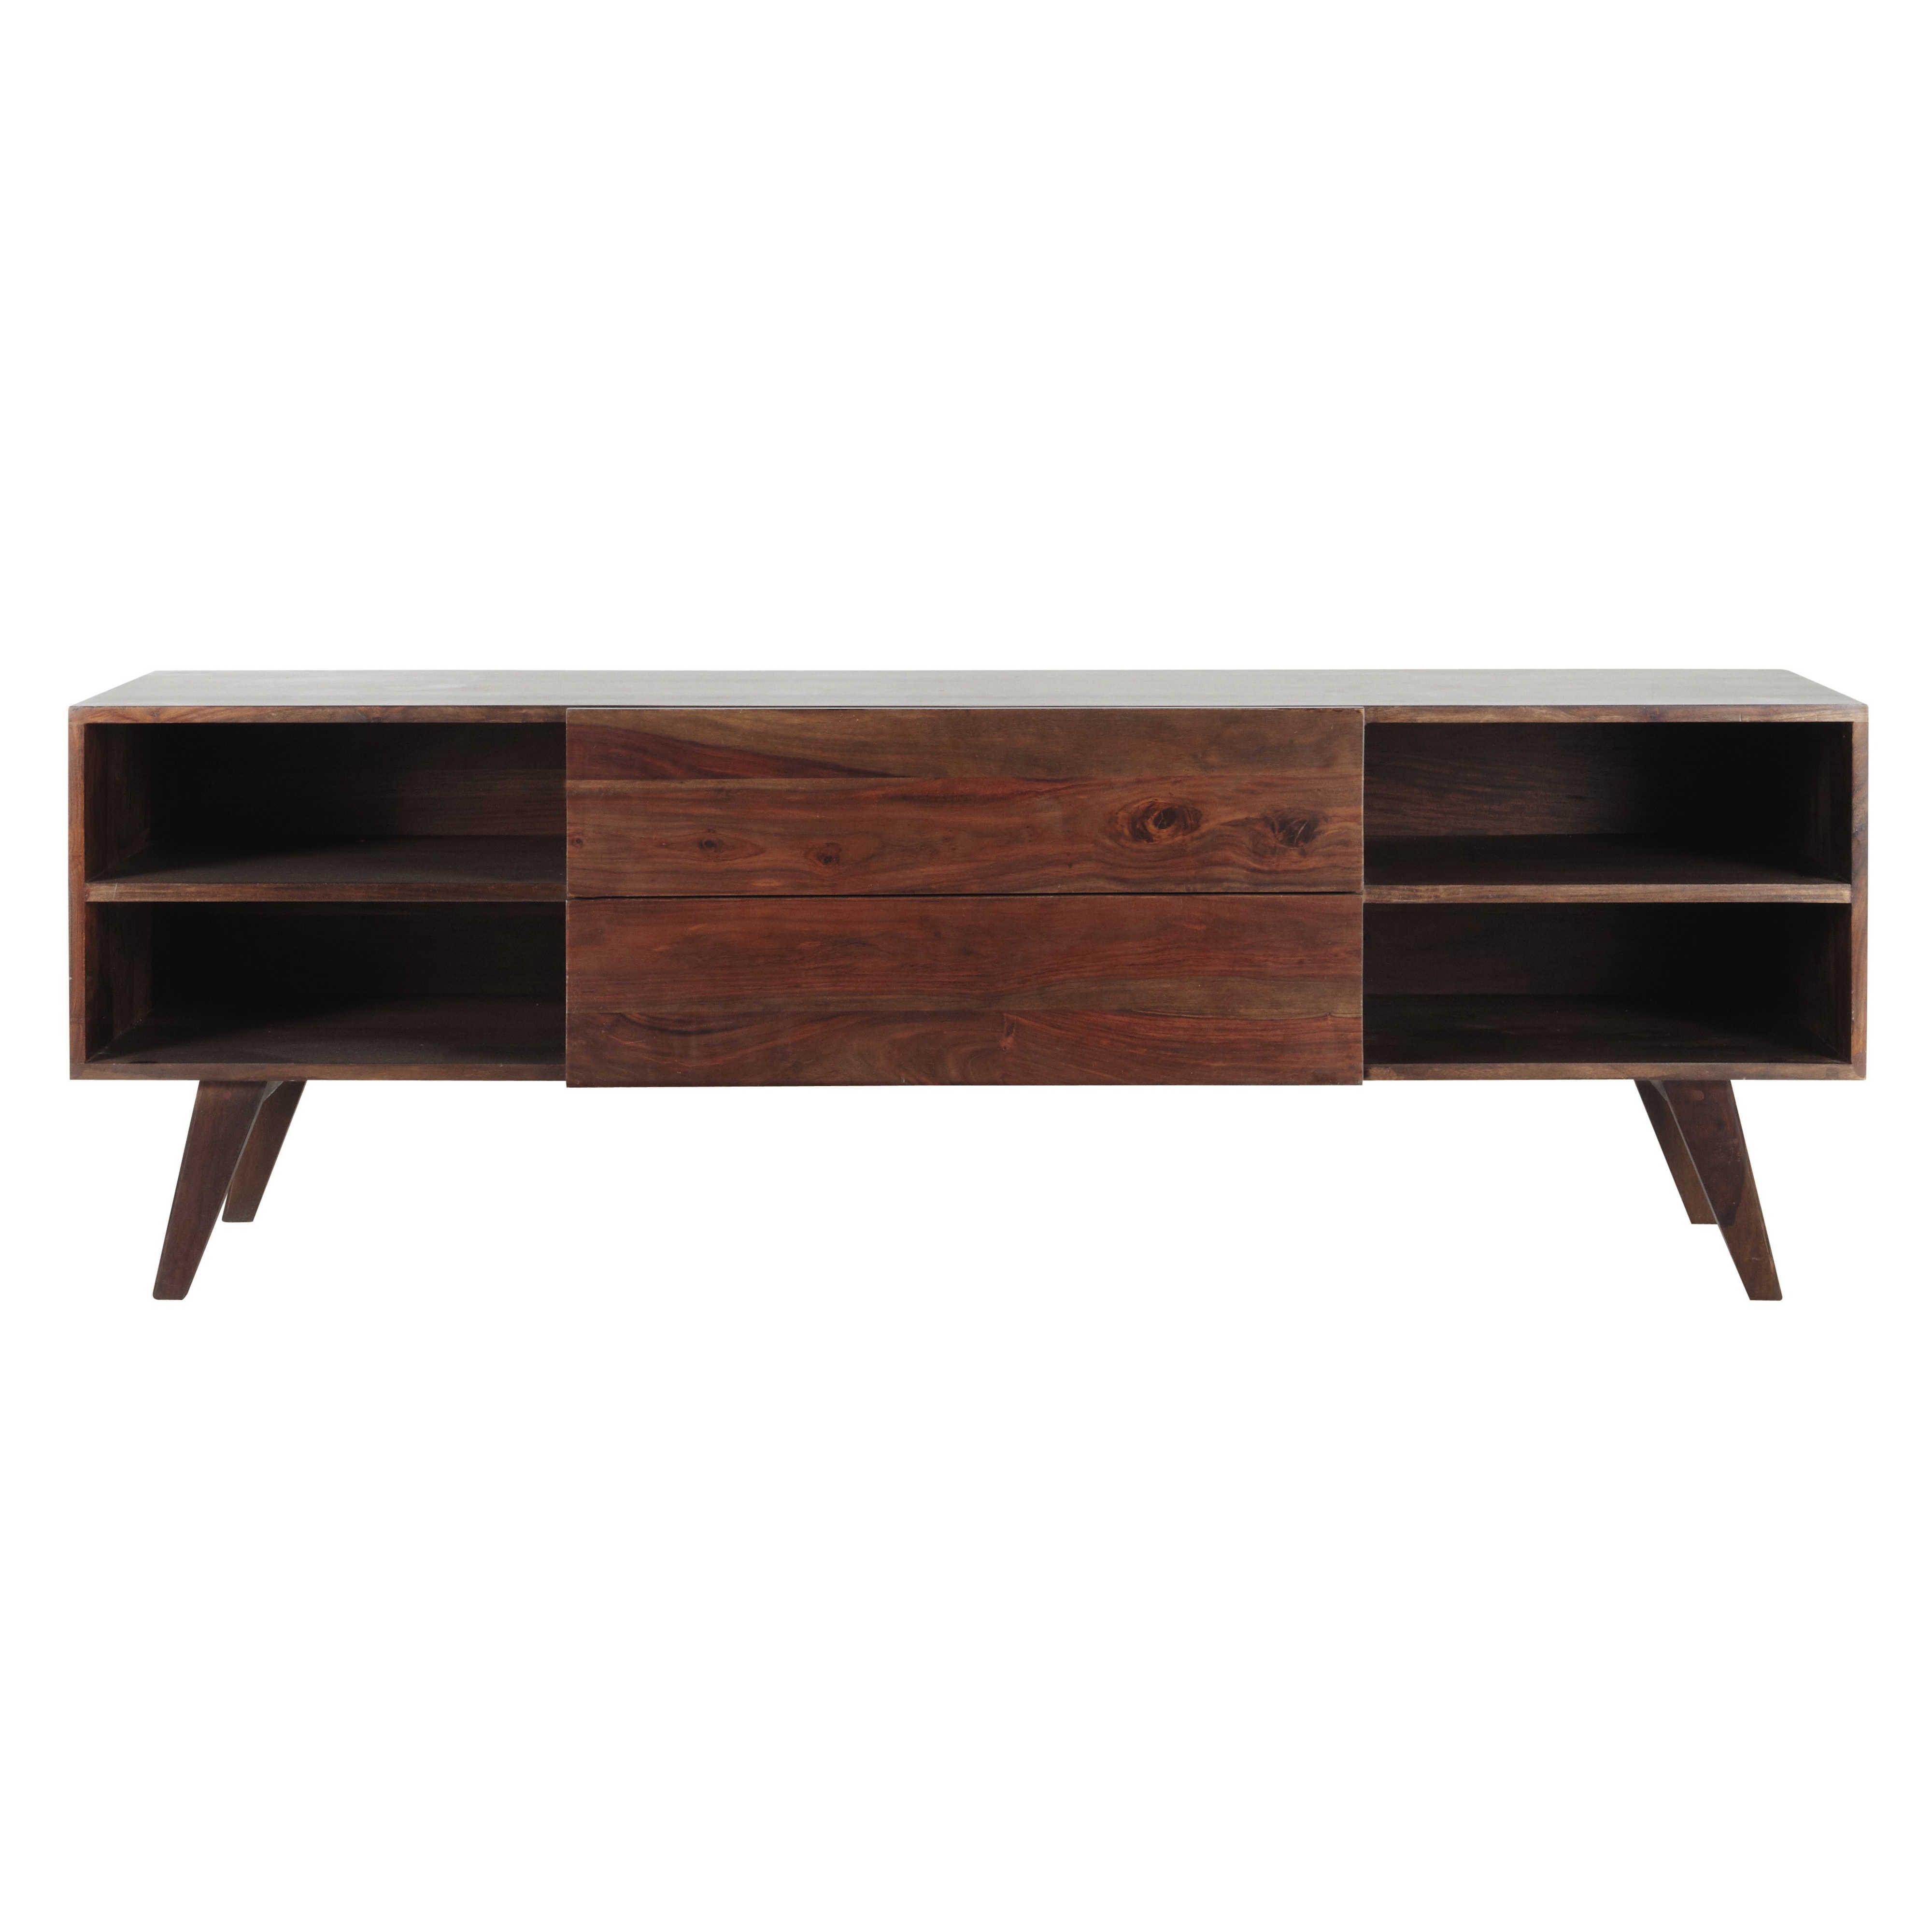 meuble tv vintage en bois de sheesham massif l 160 cm soho maisons du monde tv mobel tv hifi mobel vintage stil